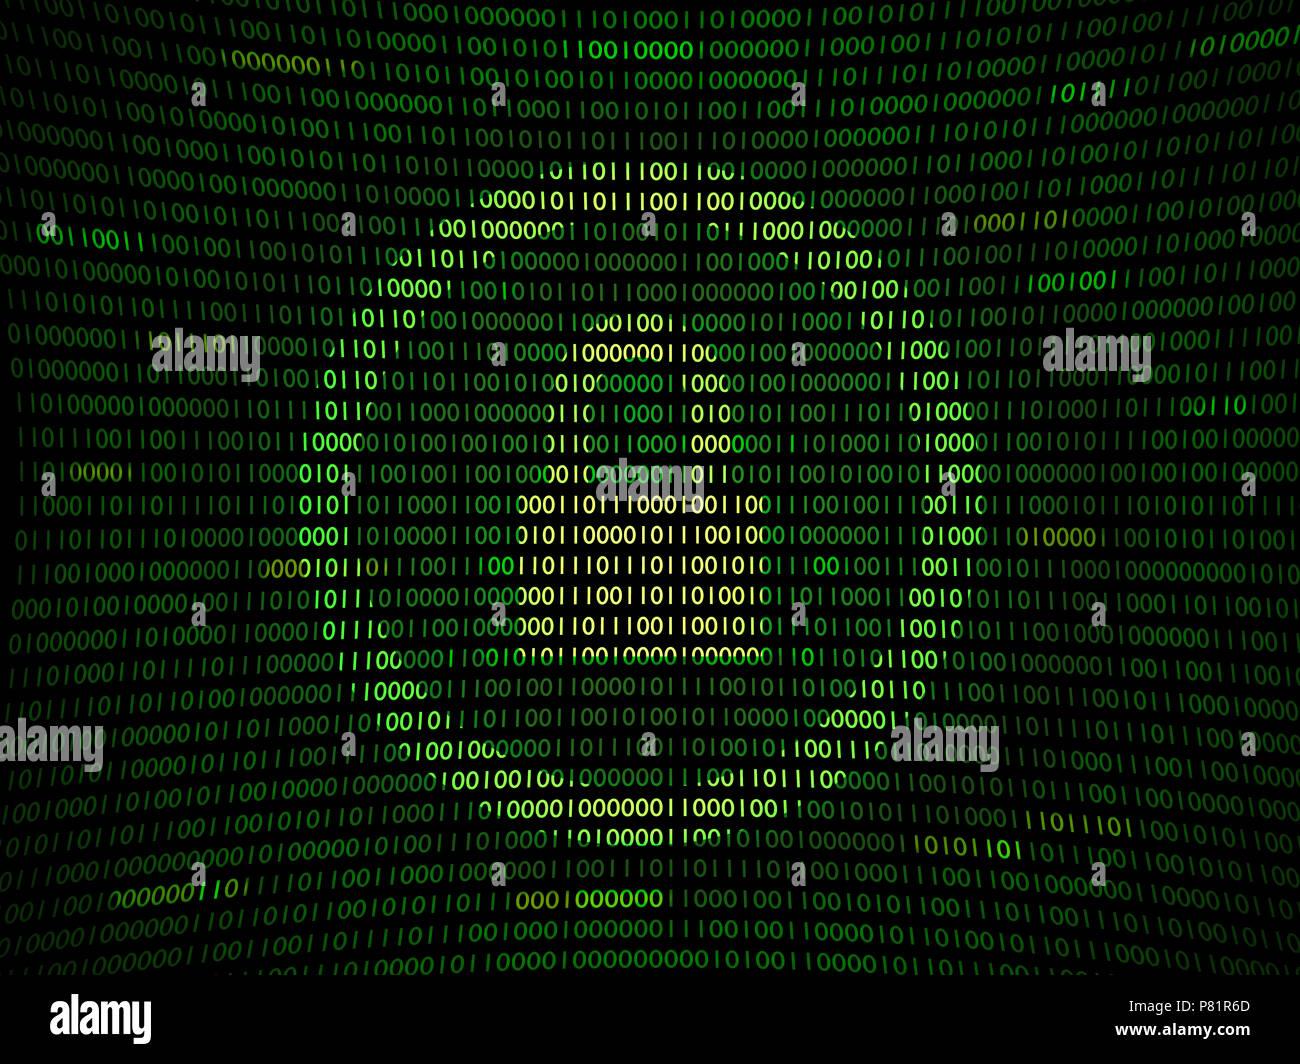 Code vulnérable hacking Photo Stock